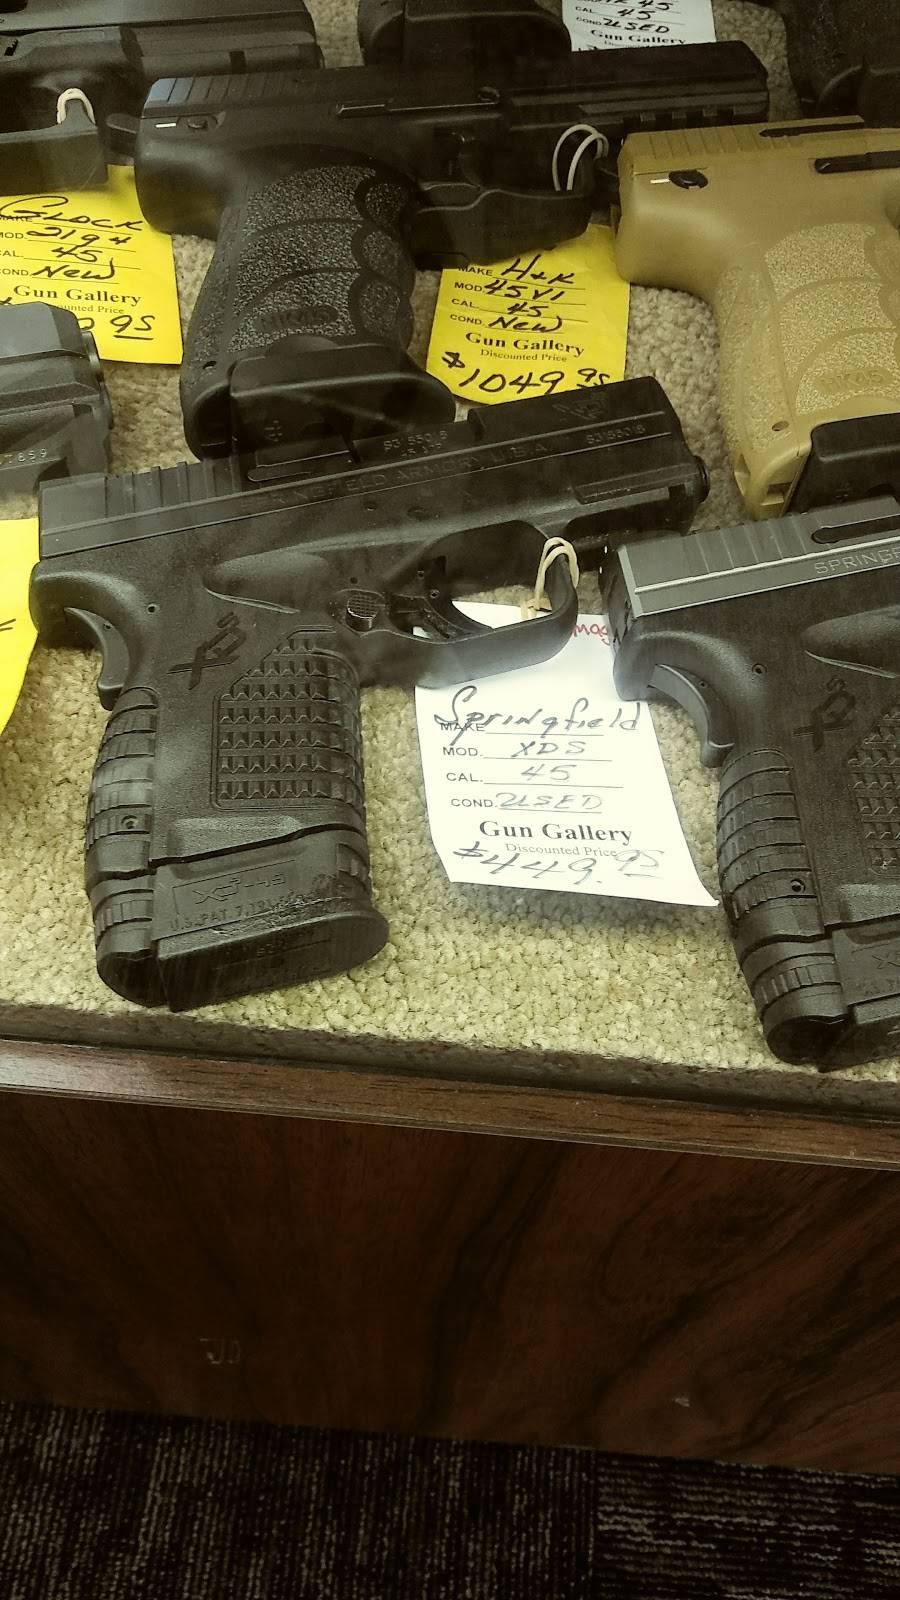 Gun Gallery - store    Photo 6 of 7   Address: 10268 Beach Blvd, Jacksonville, FL 32246, USA   Phone: (904) 641-1619